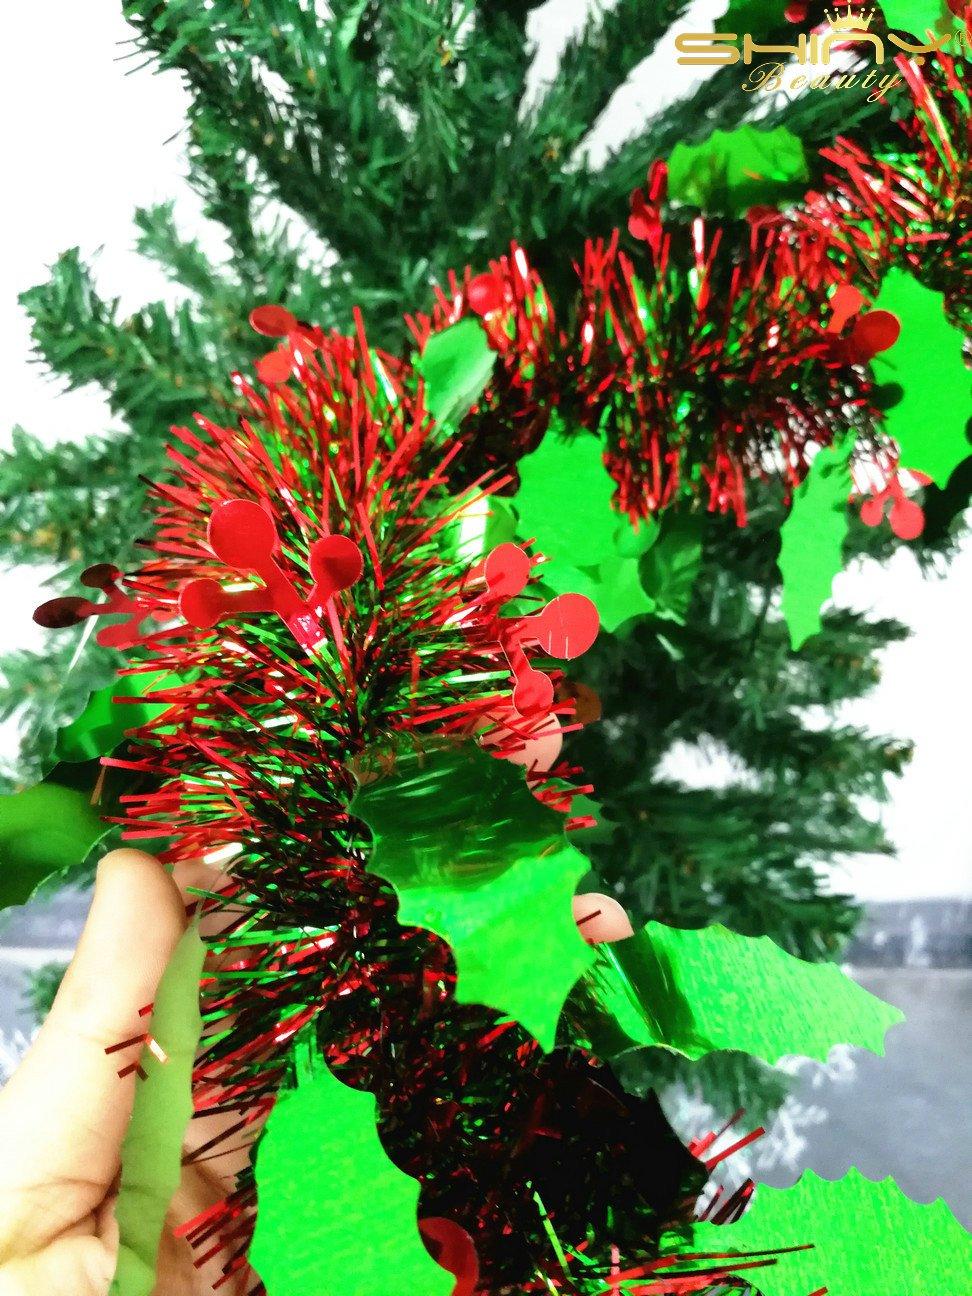 Amazon.com: Metallic Foil-Tinsel-Garland-6.5 Feet long for Christmas ...